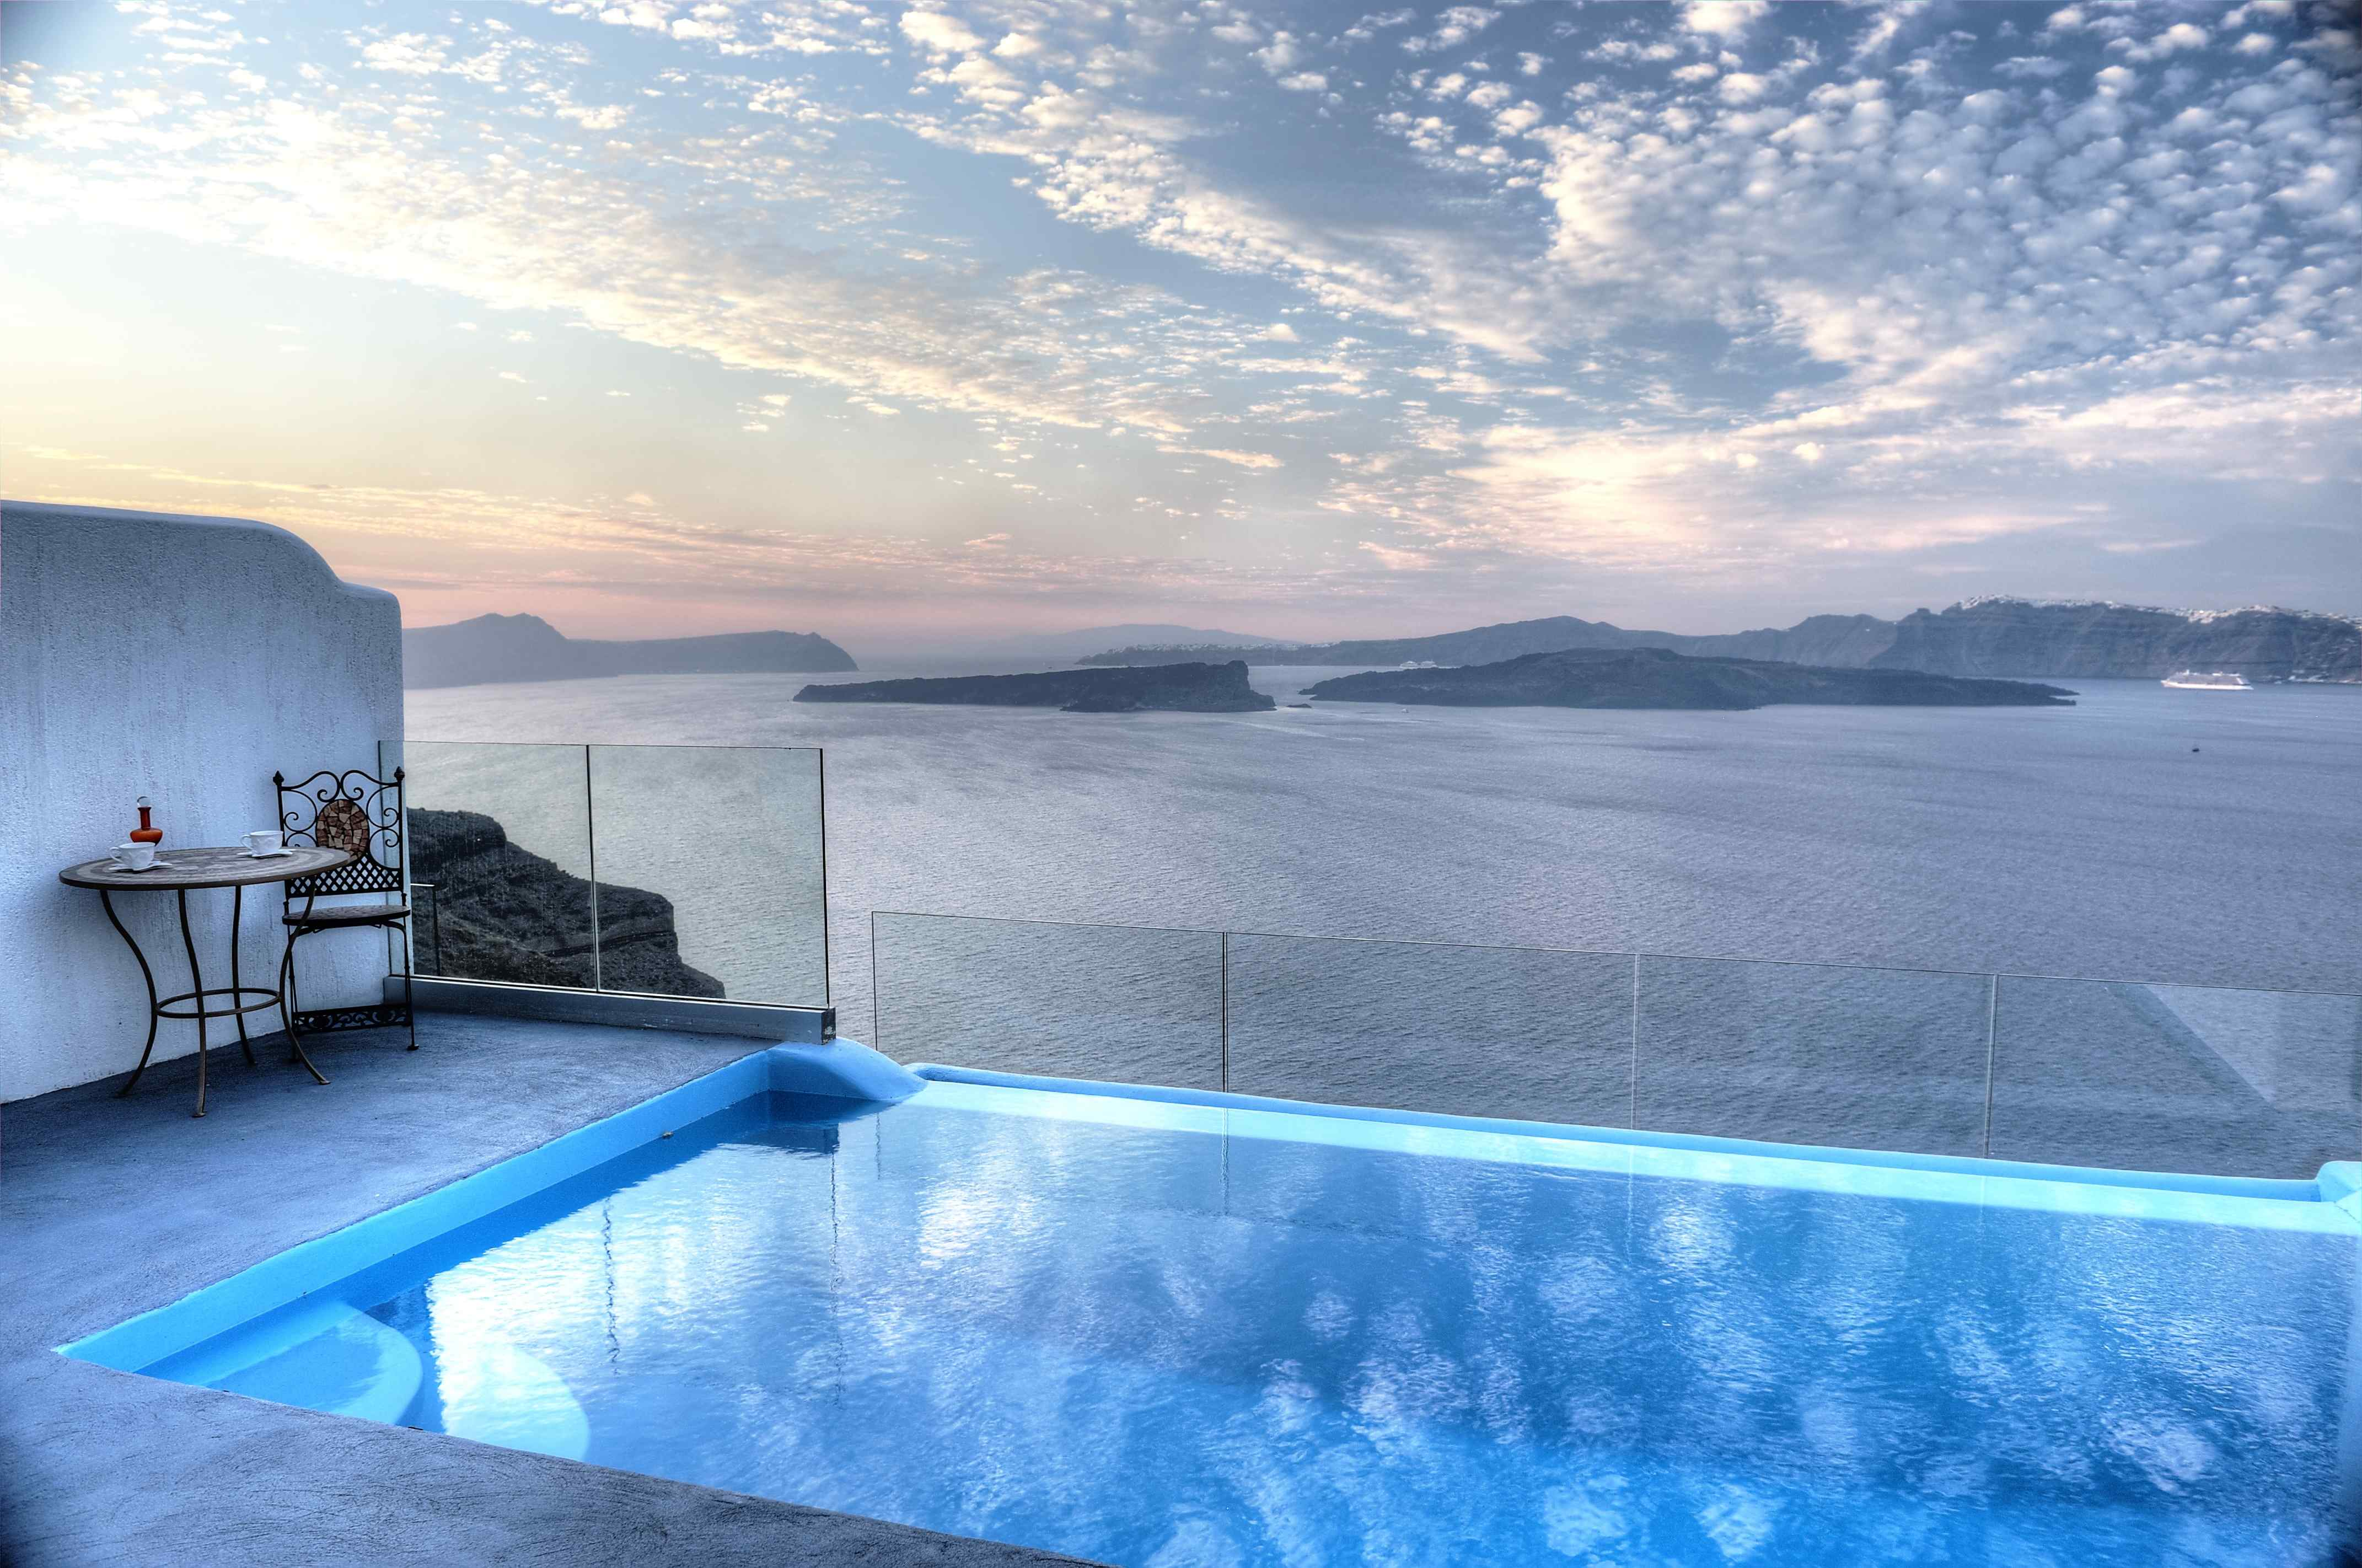 vacationstayz house rentals